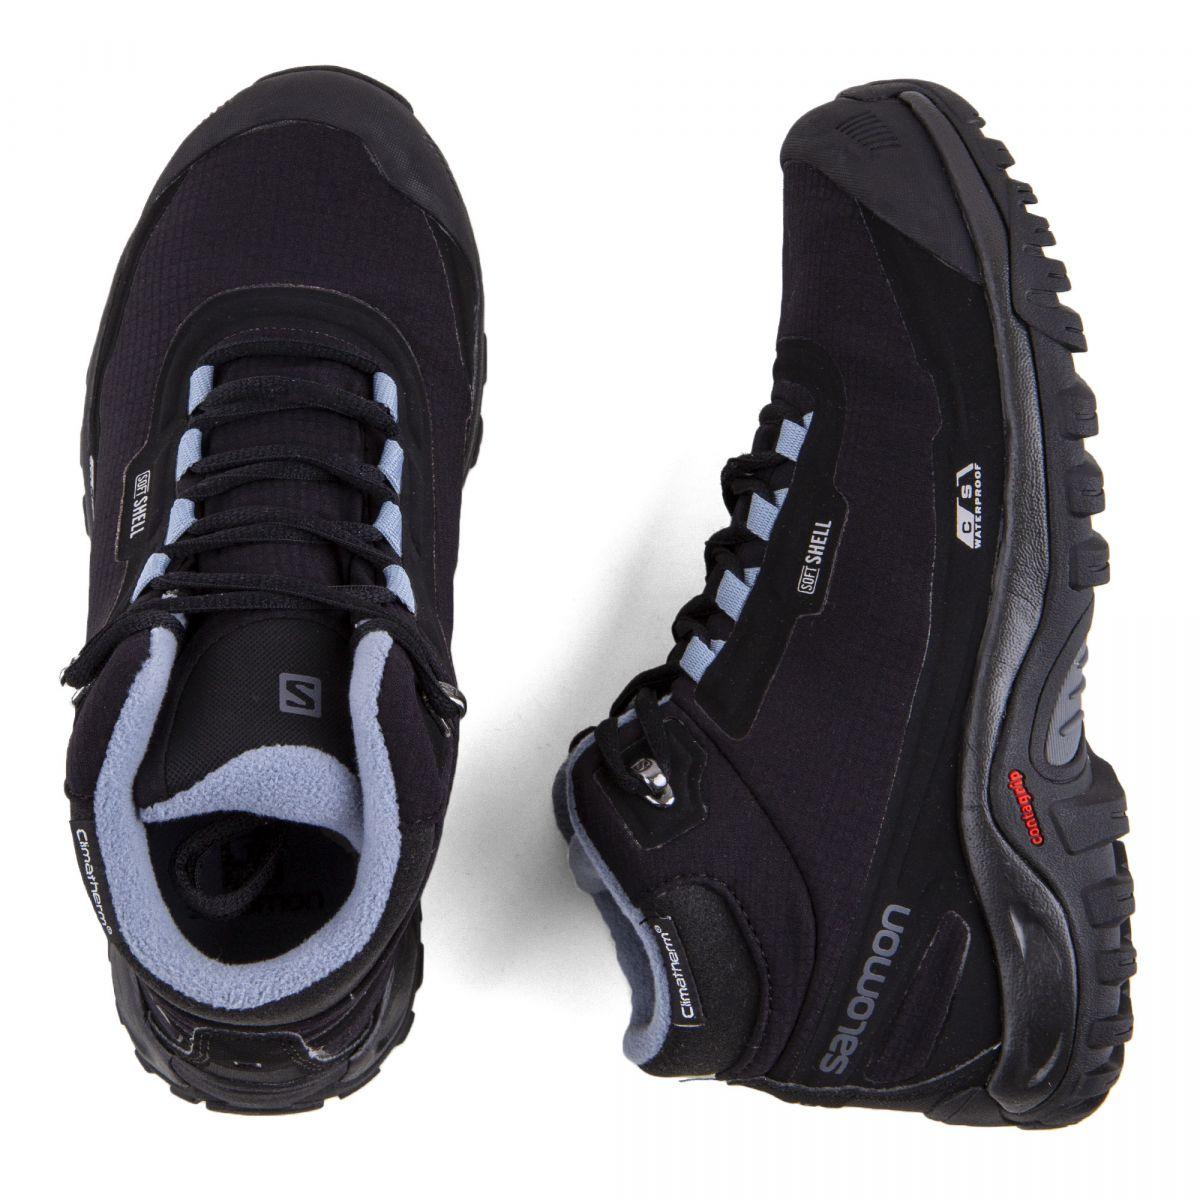 De Cs Chaussures À Femme Shelter Waterproof Wp Salomon Randonnées 6fyb7vgIY